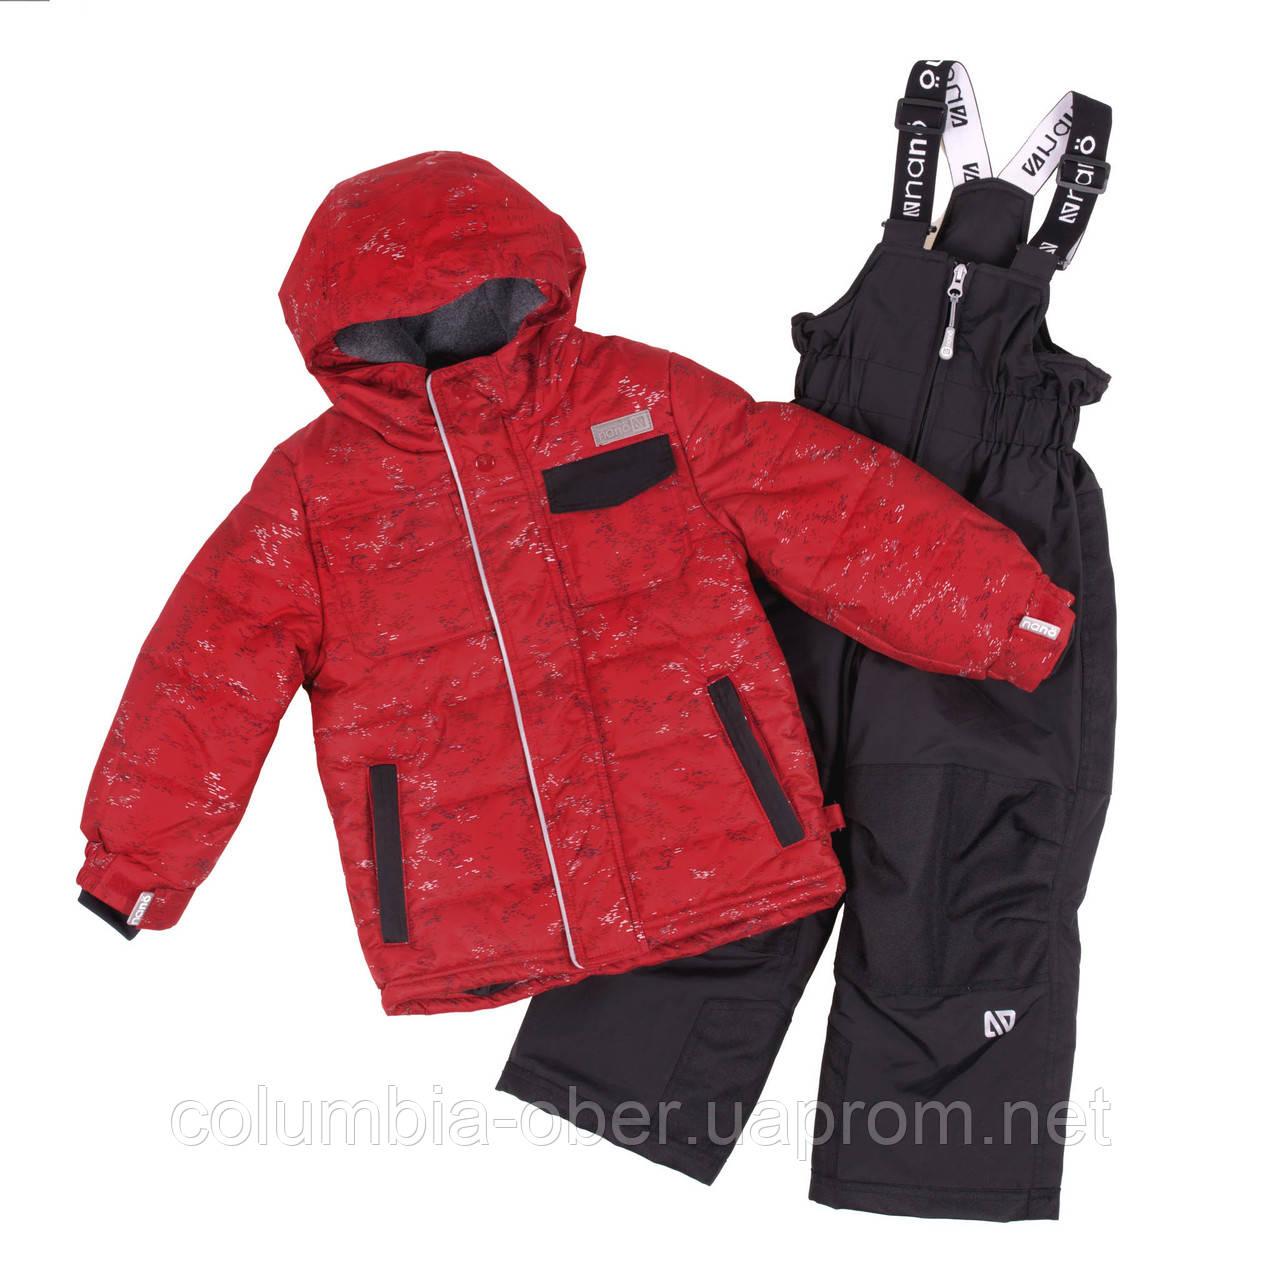 Зимний комплект для мальчика NANO F18 M 255 Really red. Размеры 2-12.